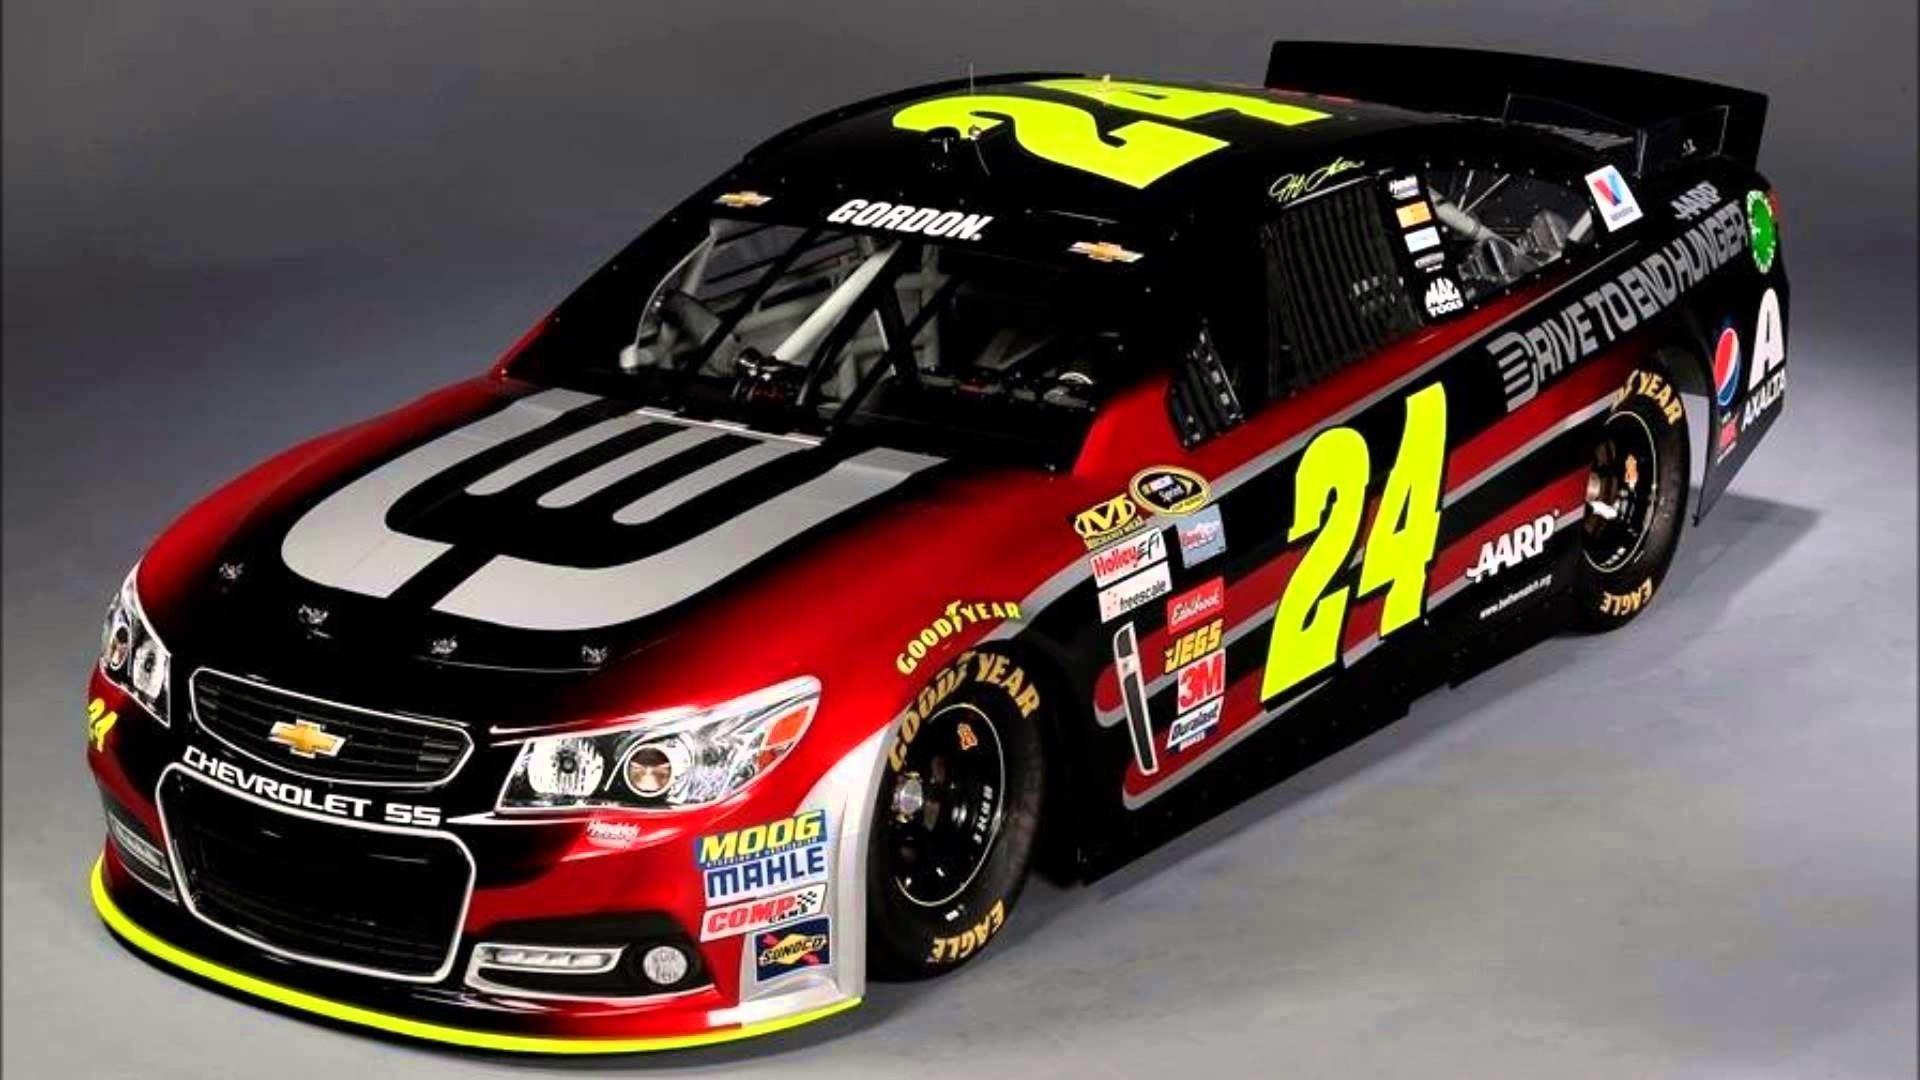 Free Nascar Wallpaper: Top Free NASCAR Backgrounds